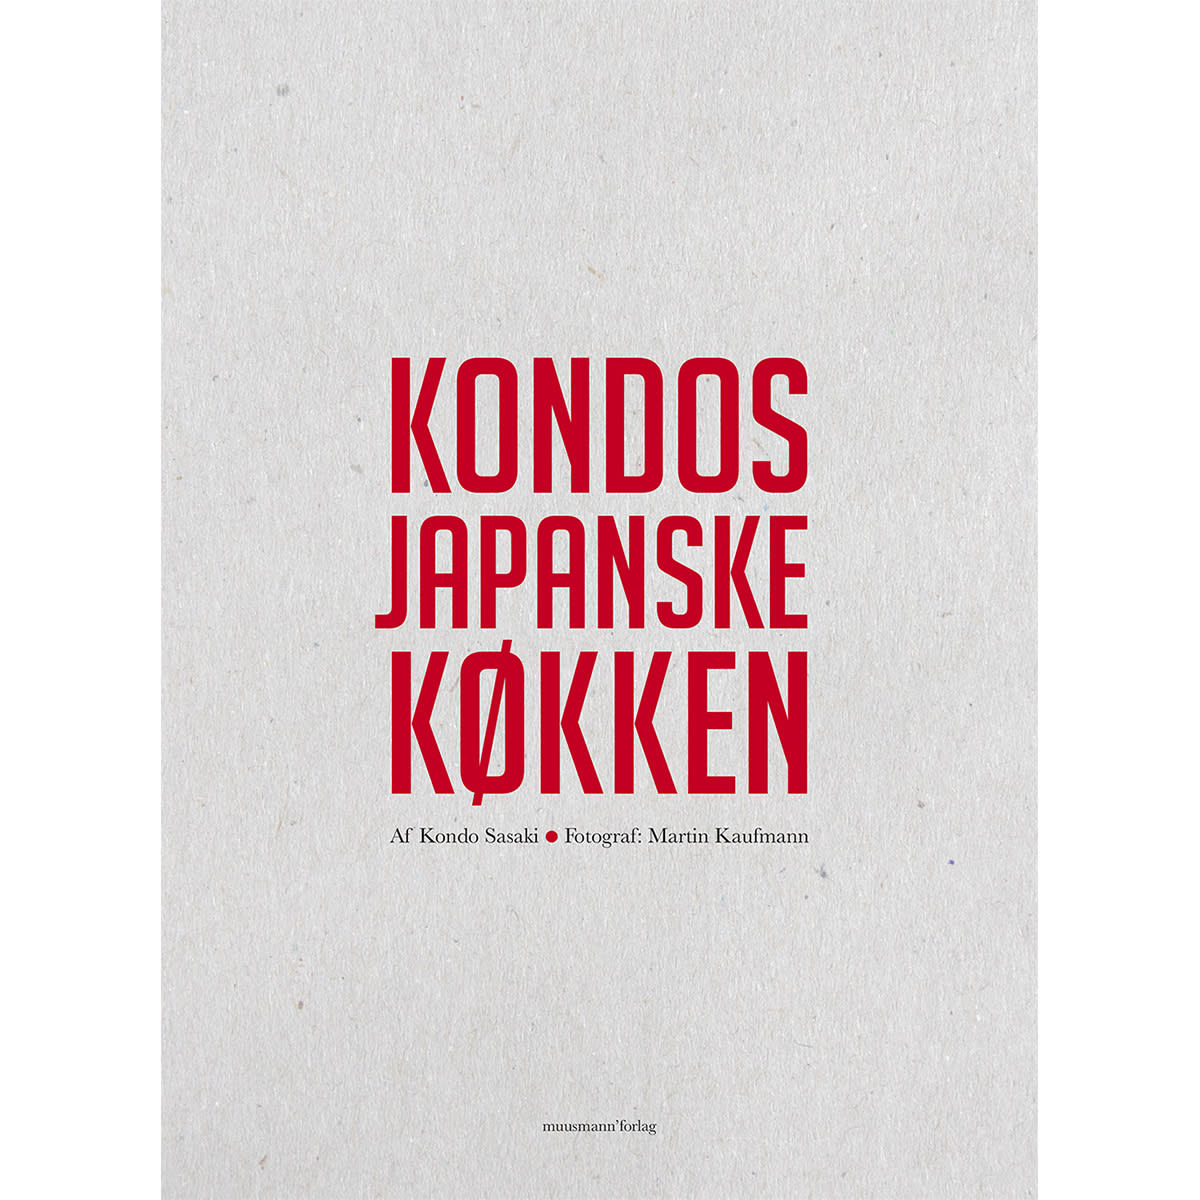 Af Kondo Sasaki